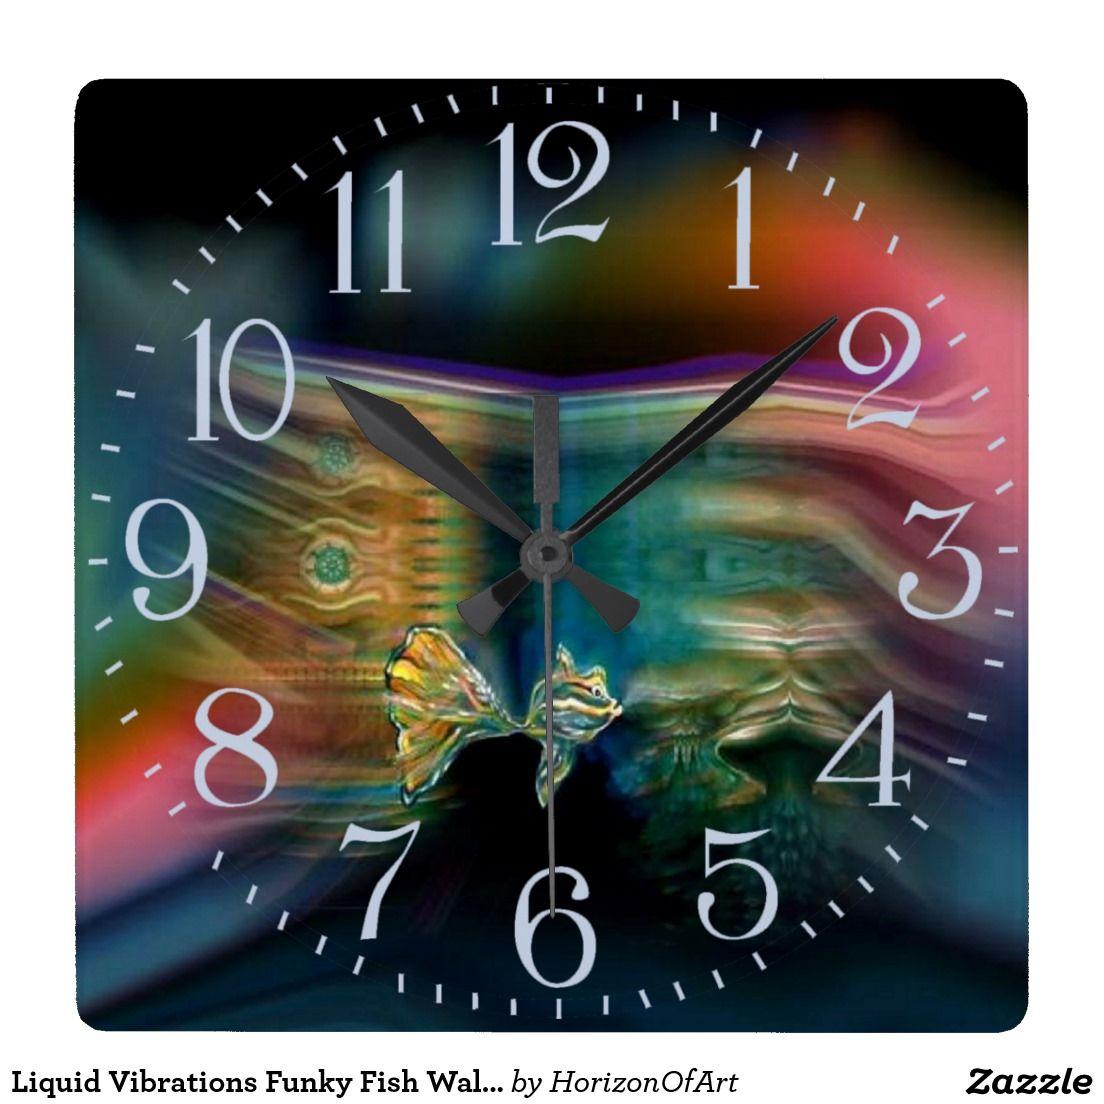 Liquid vibrations funky fish wall clock wall clocks and clocks liquid vibrations funky fish wall clock amipublicfo Images